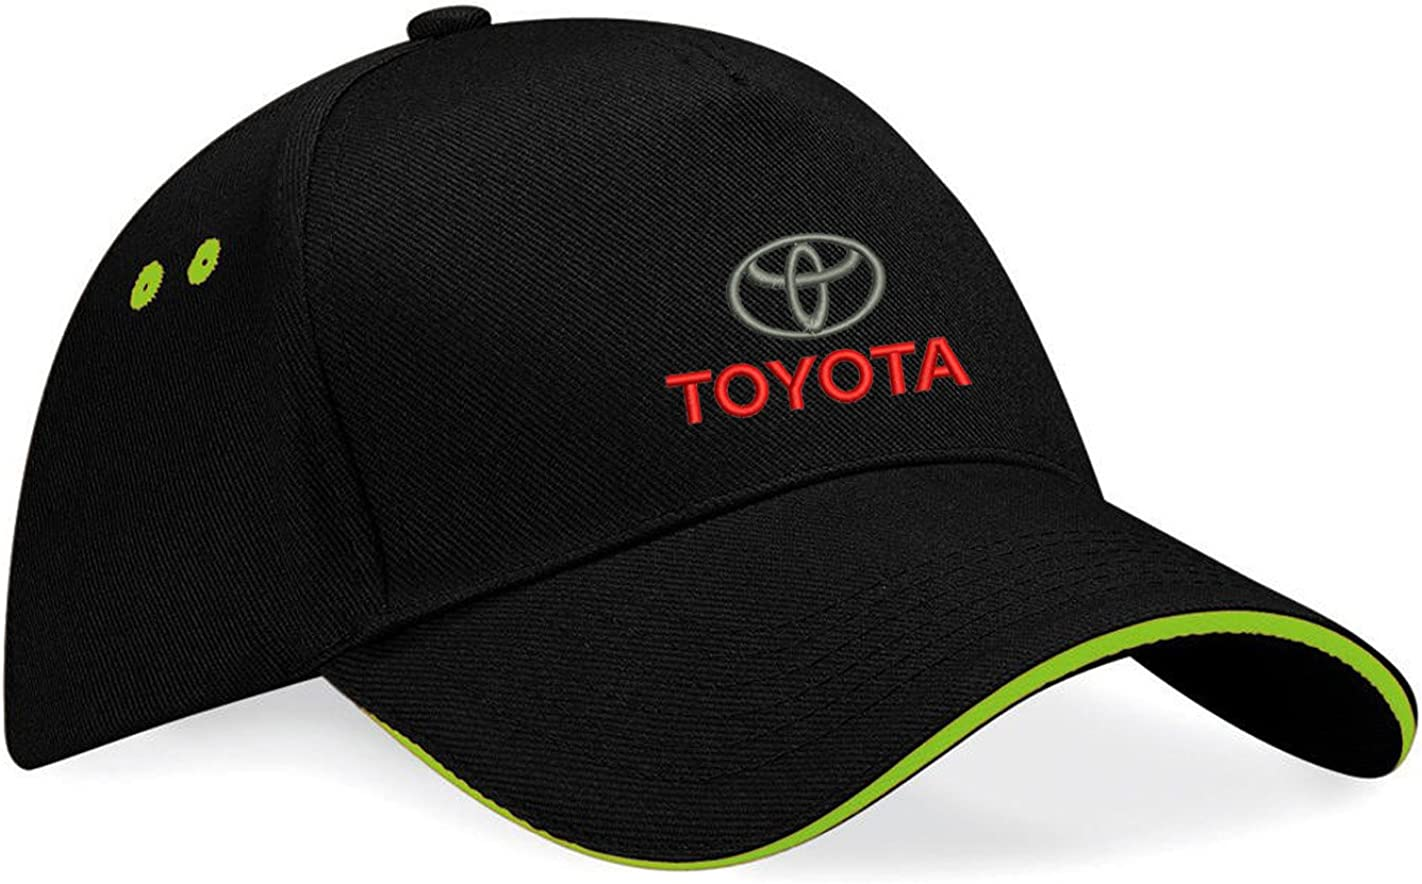 Inconnu Toyota Unisexe Adulte Caps Baseball R/églable Broderie Coton k097